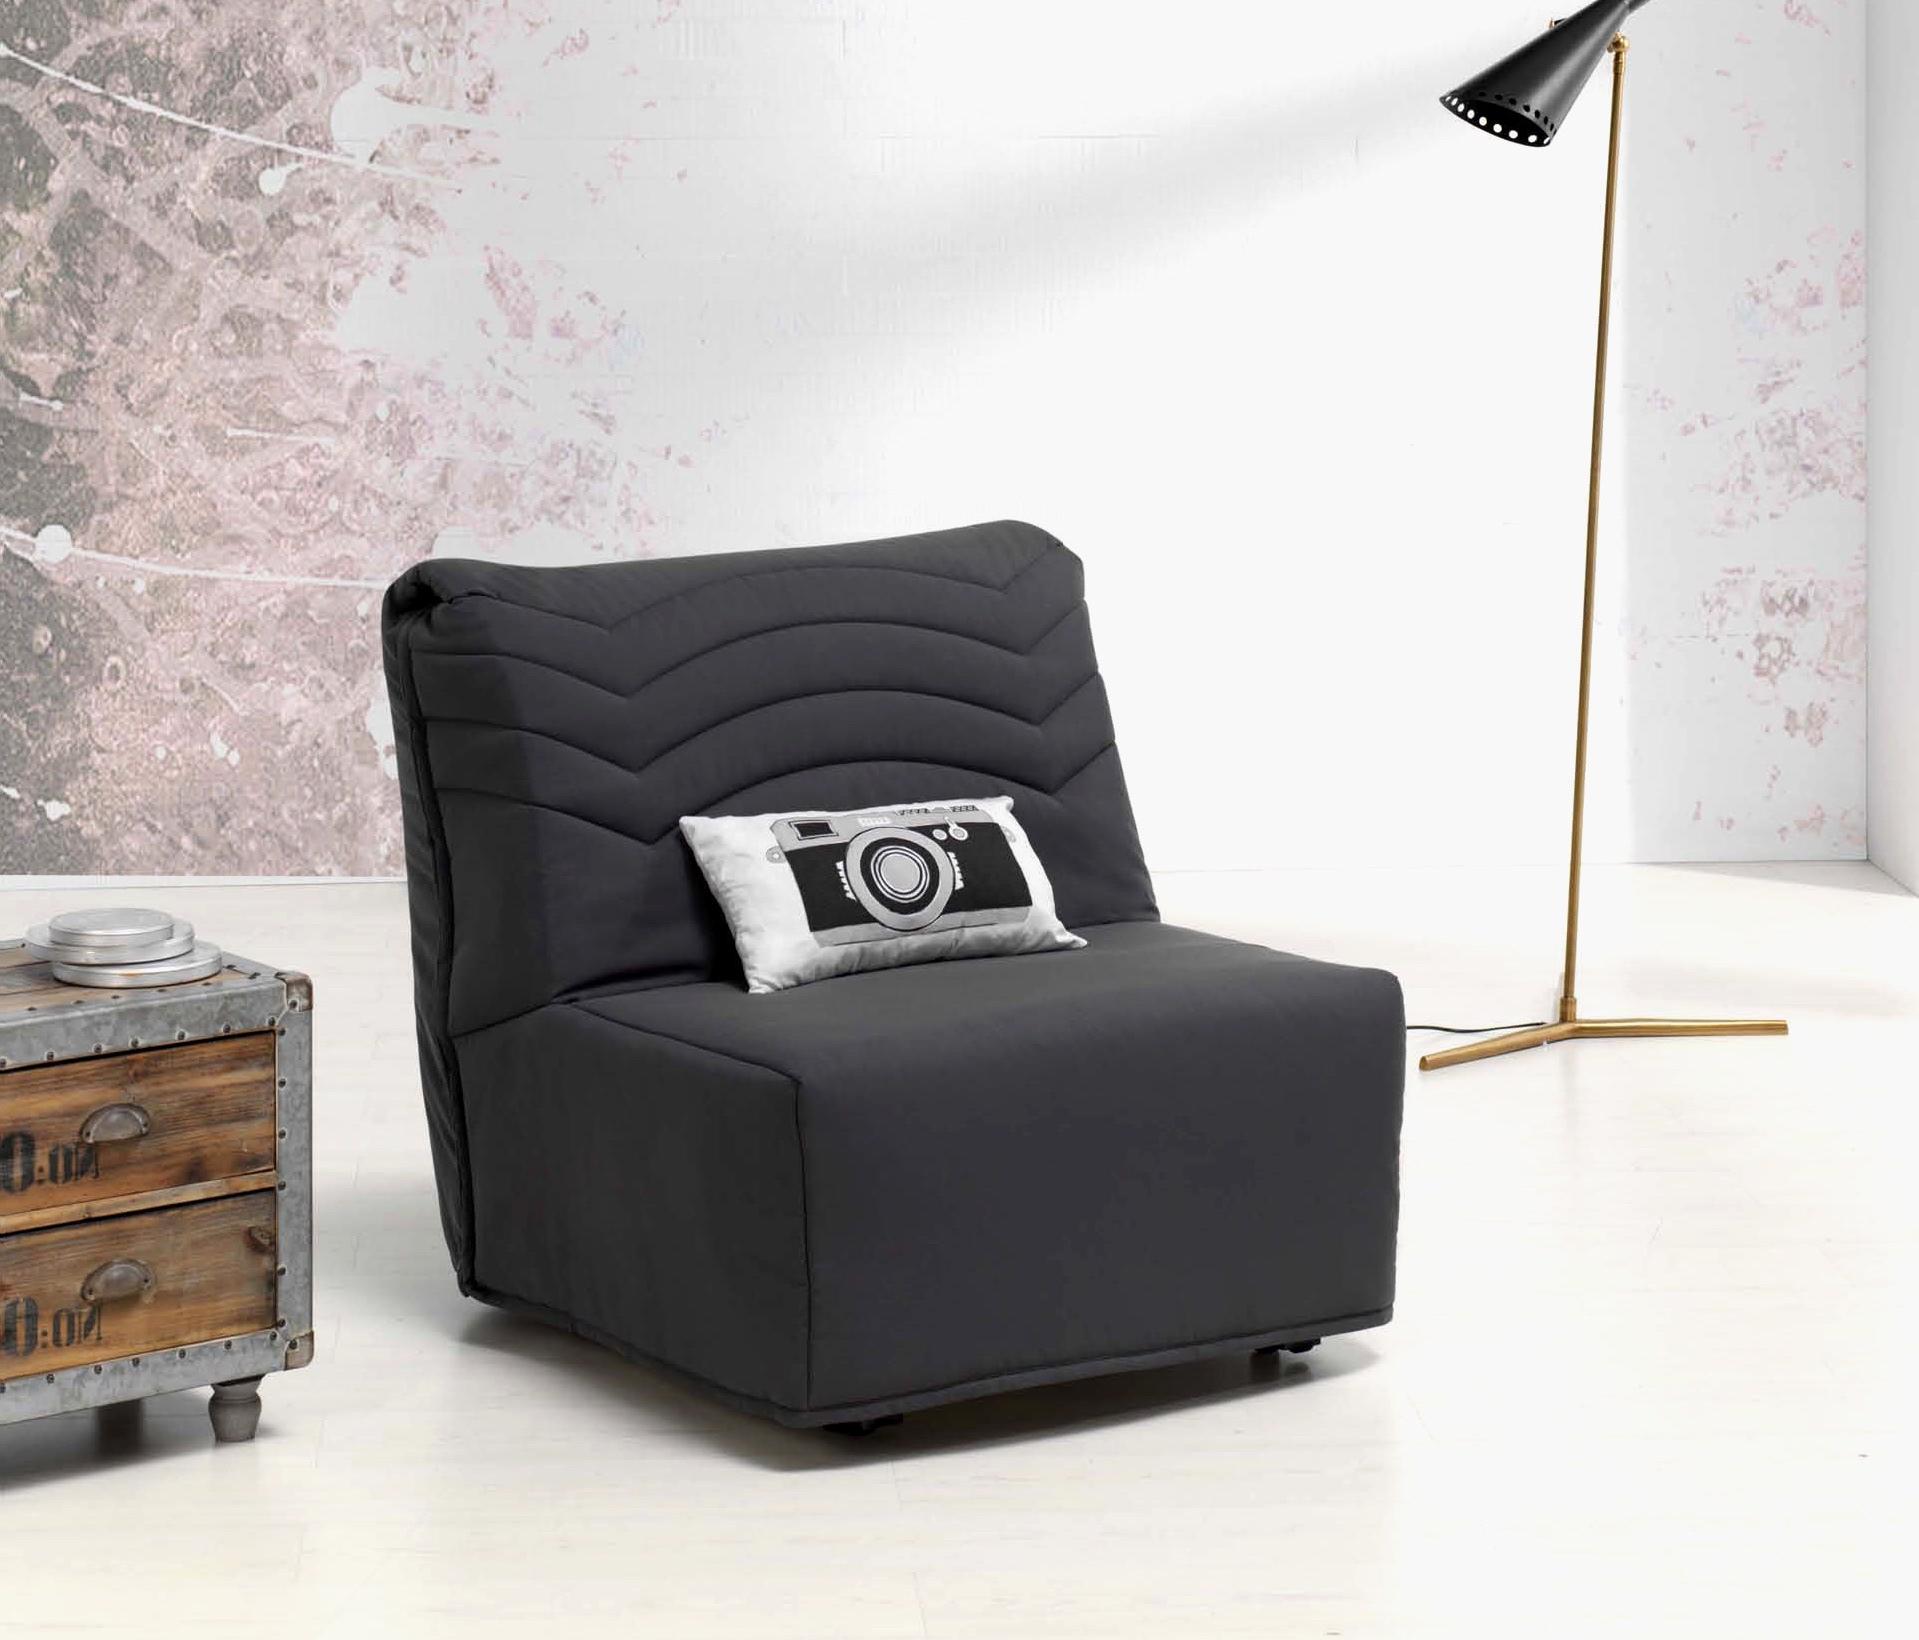 Sillon Cama 1 Plaza Merkamueble 9ddf Merkamueble sofas Cama 60 Creaciones Sillon Cama 1 Plaza Merkamueble